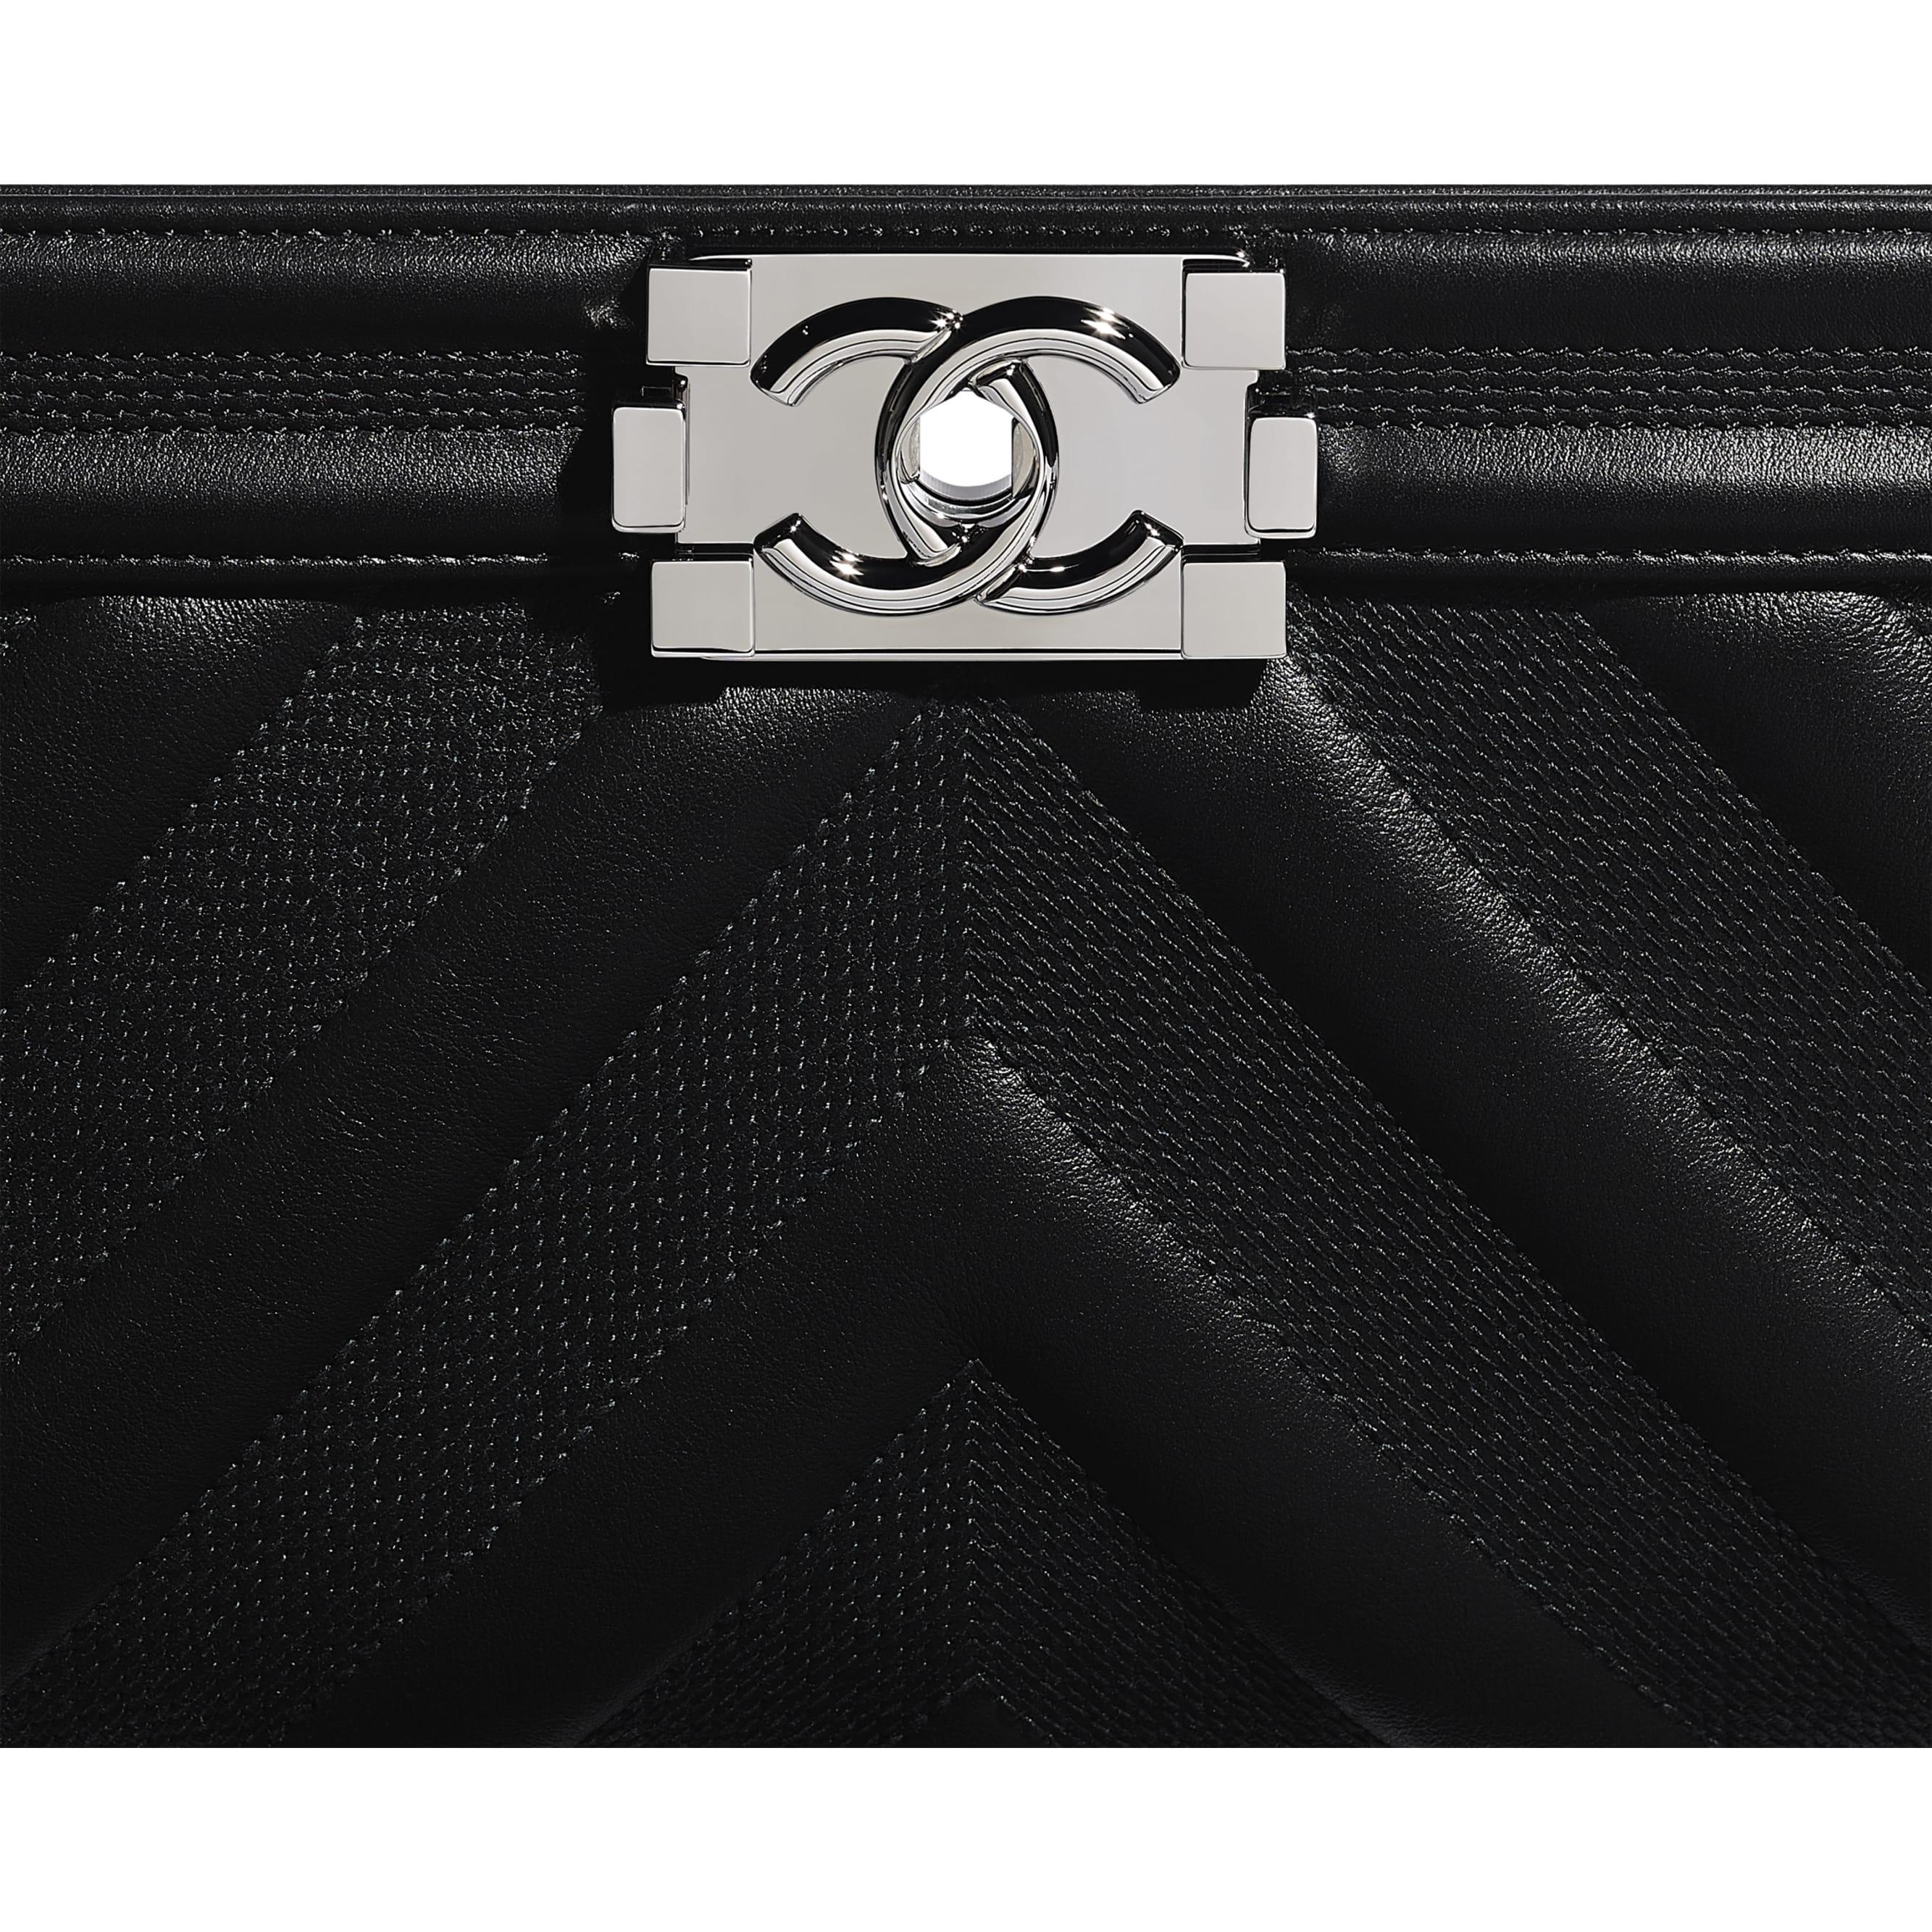 BOY CHANEL Handbag - Black - Calfskin & Ruthenium-Finish Metal - Extra view - see standard sized version